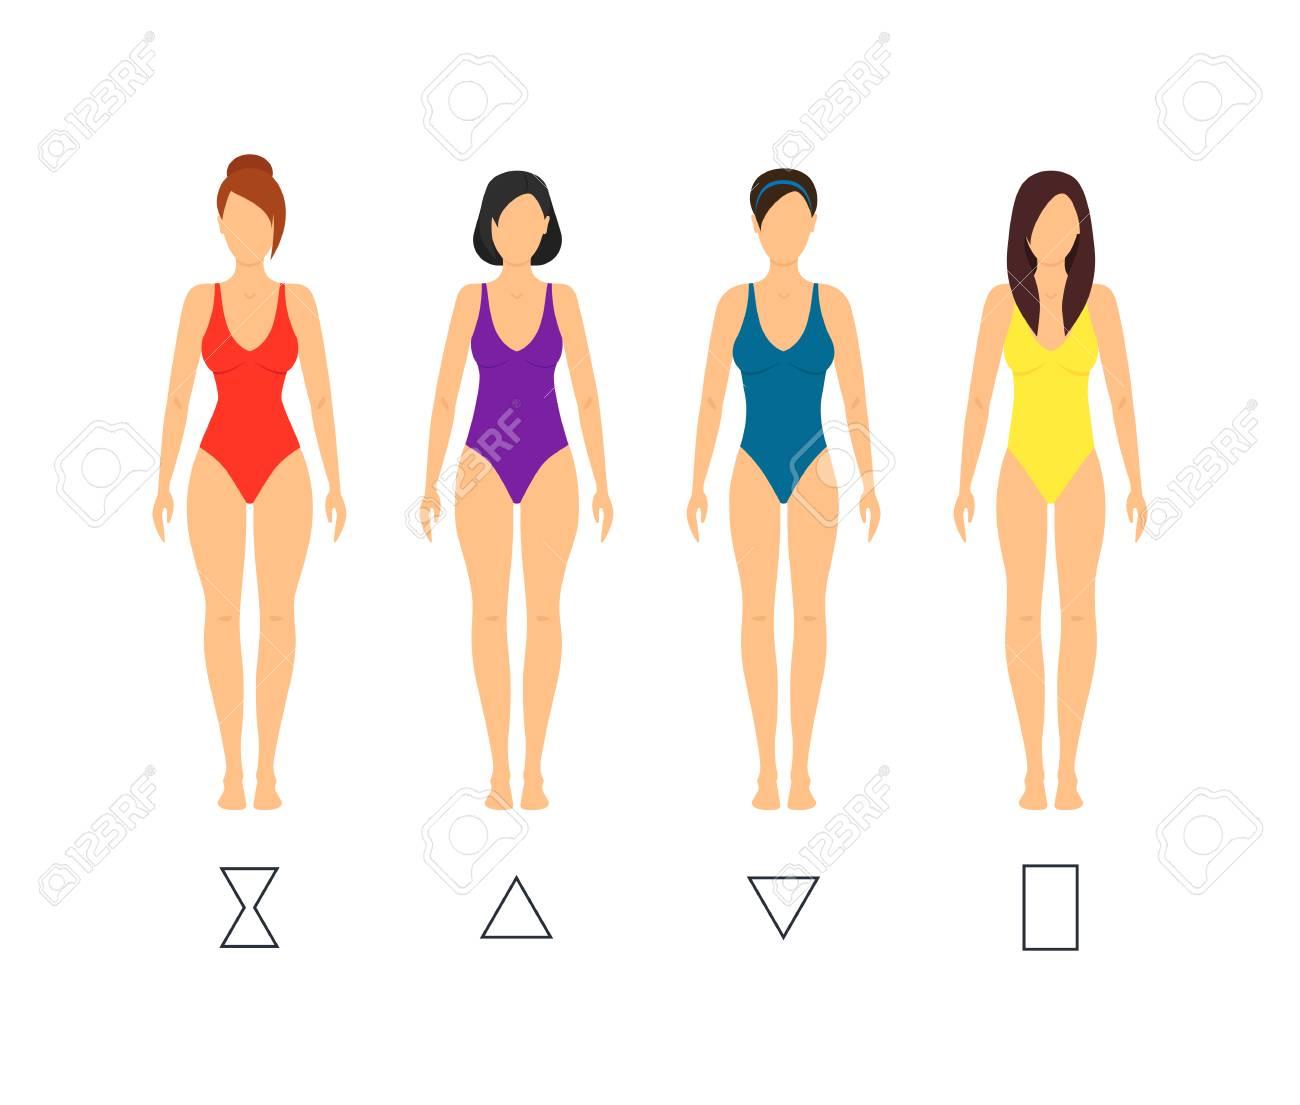 6f037aa297e Cartoon Female Body Shape Types Woman Anatomy Figure Constitution Flat  Design Style. Vector illustration Stock